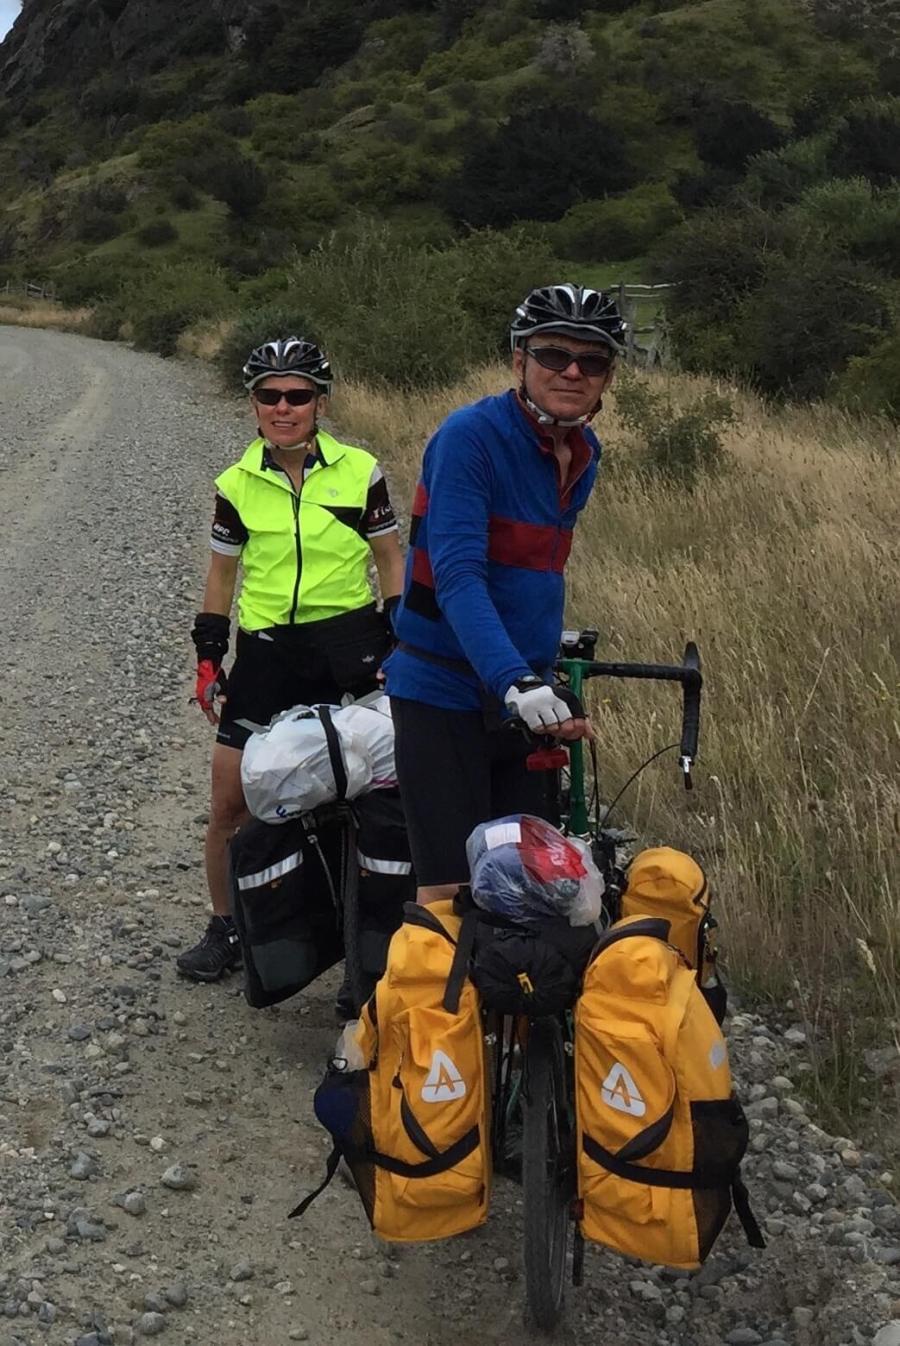 Touring Patagonia on folding bikes